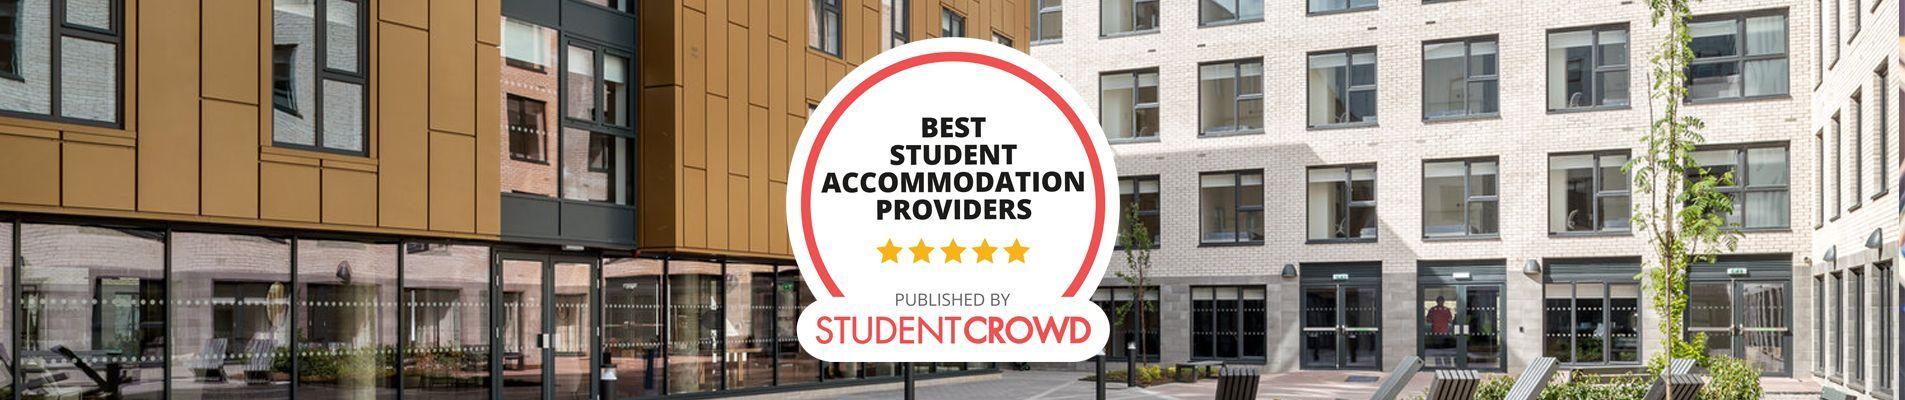 StudentCrowd-Best-Accom-Providers-2019